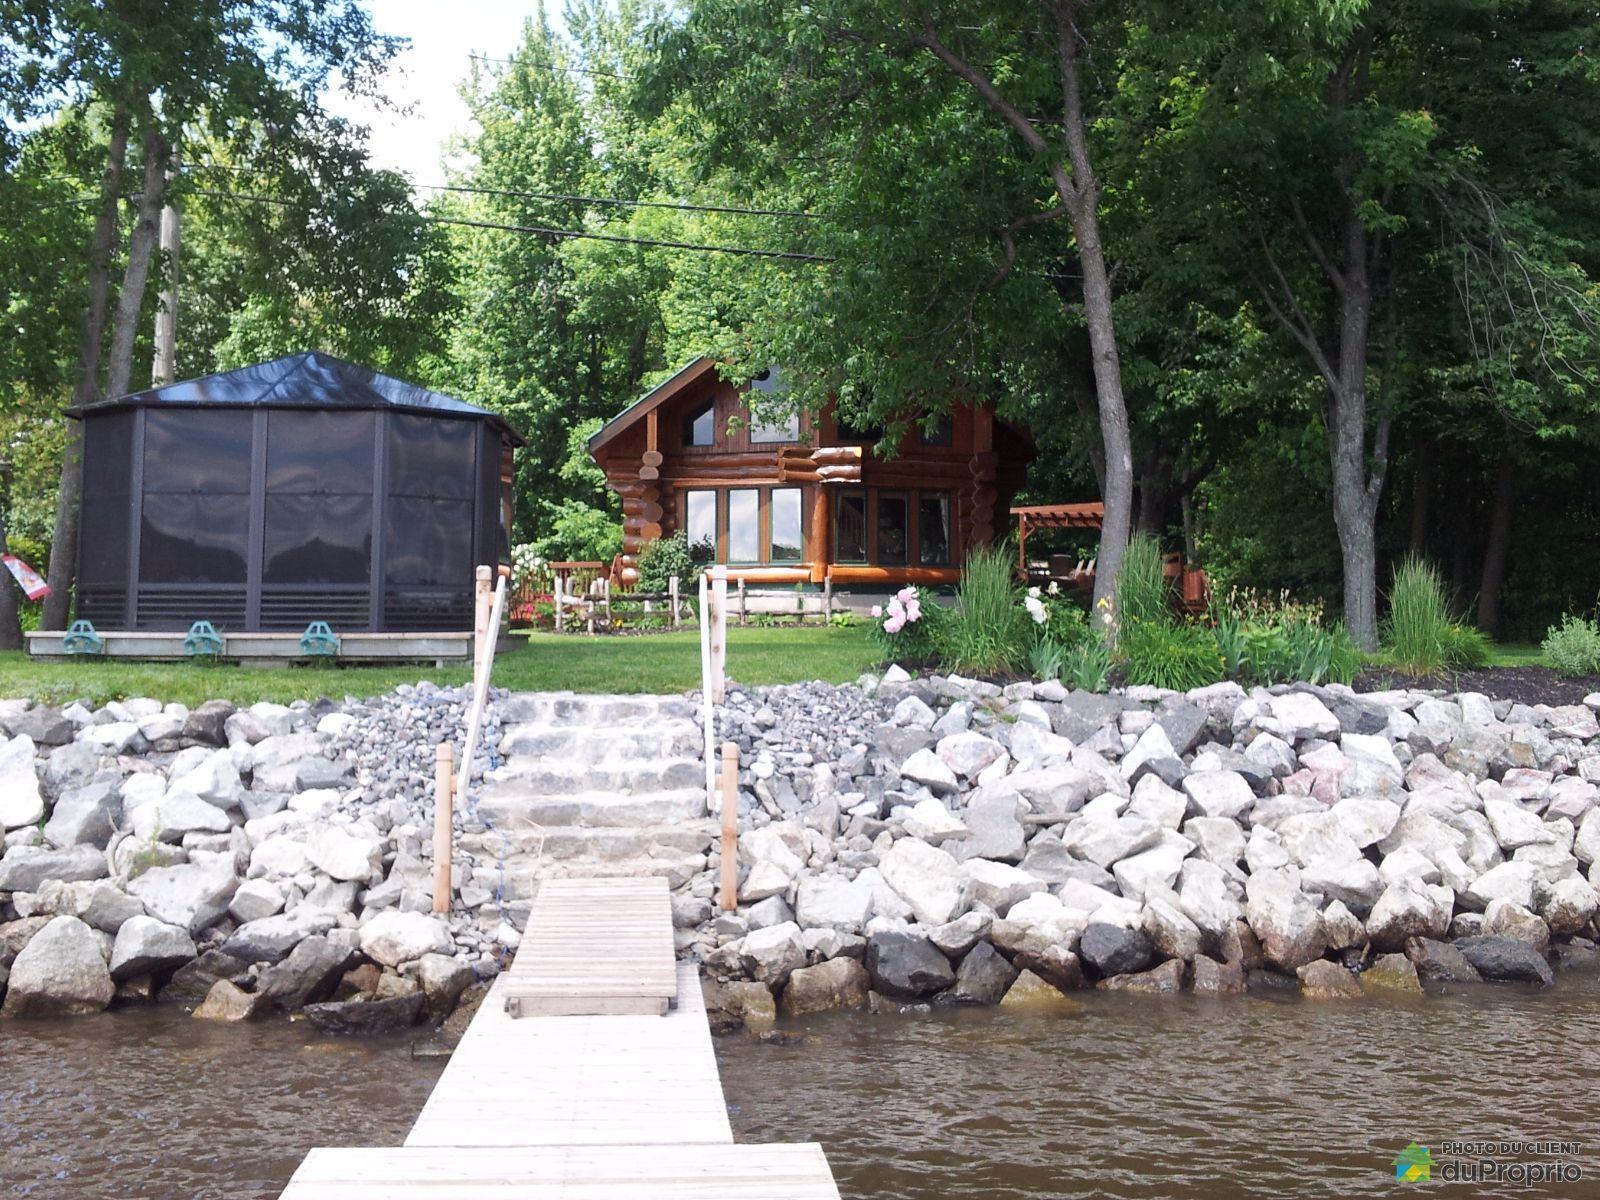 maison vendre masson angers 137 chemin du fer cheval immobilier qu bec duproprio 695606. Black Bedroom Furniture Sets. Home Design Ideas